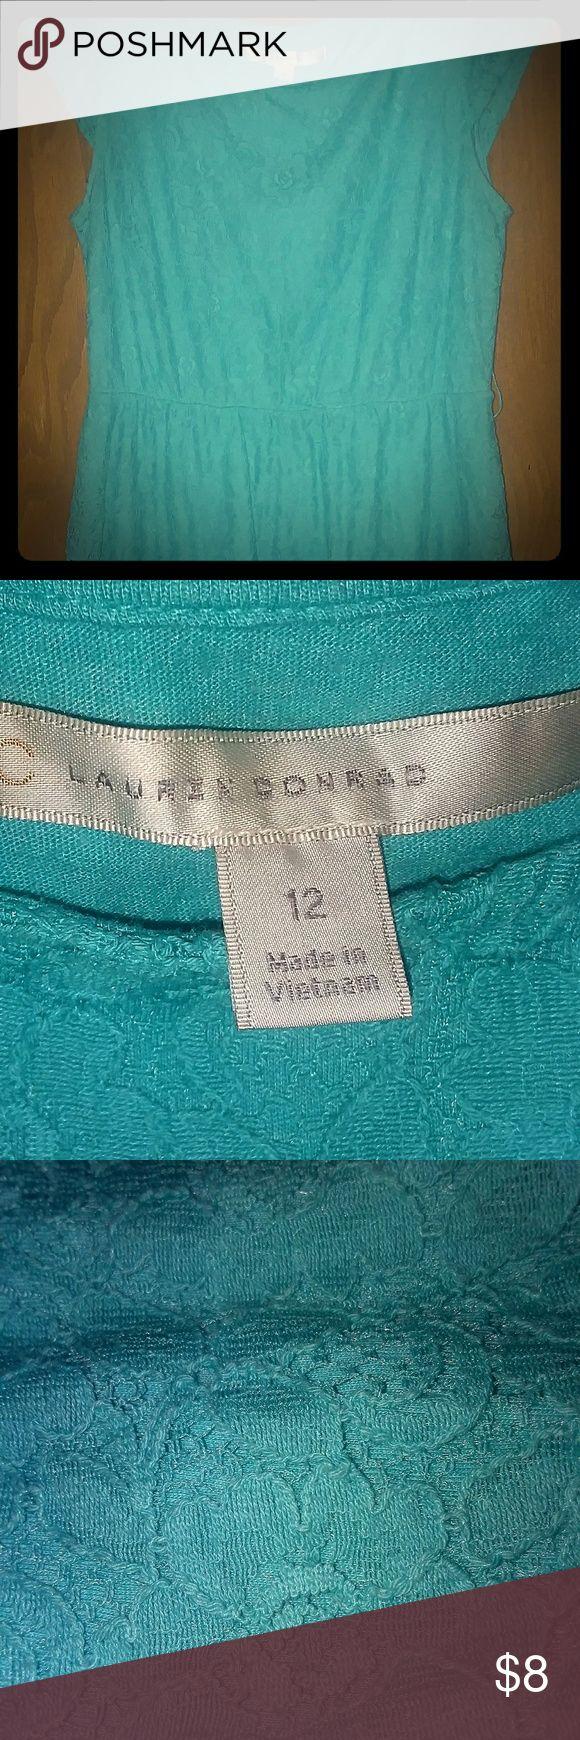 Girl's Dress Pretty light teal ombre short sleeve summer dress. laura conrad Dresses Casual